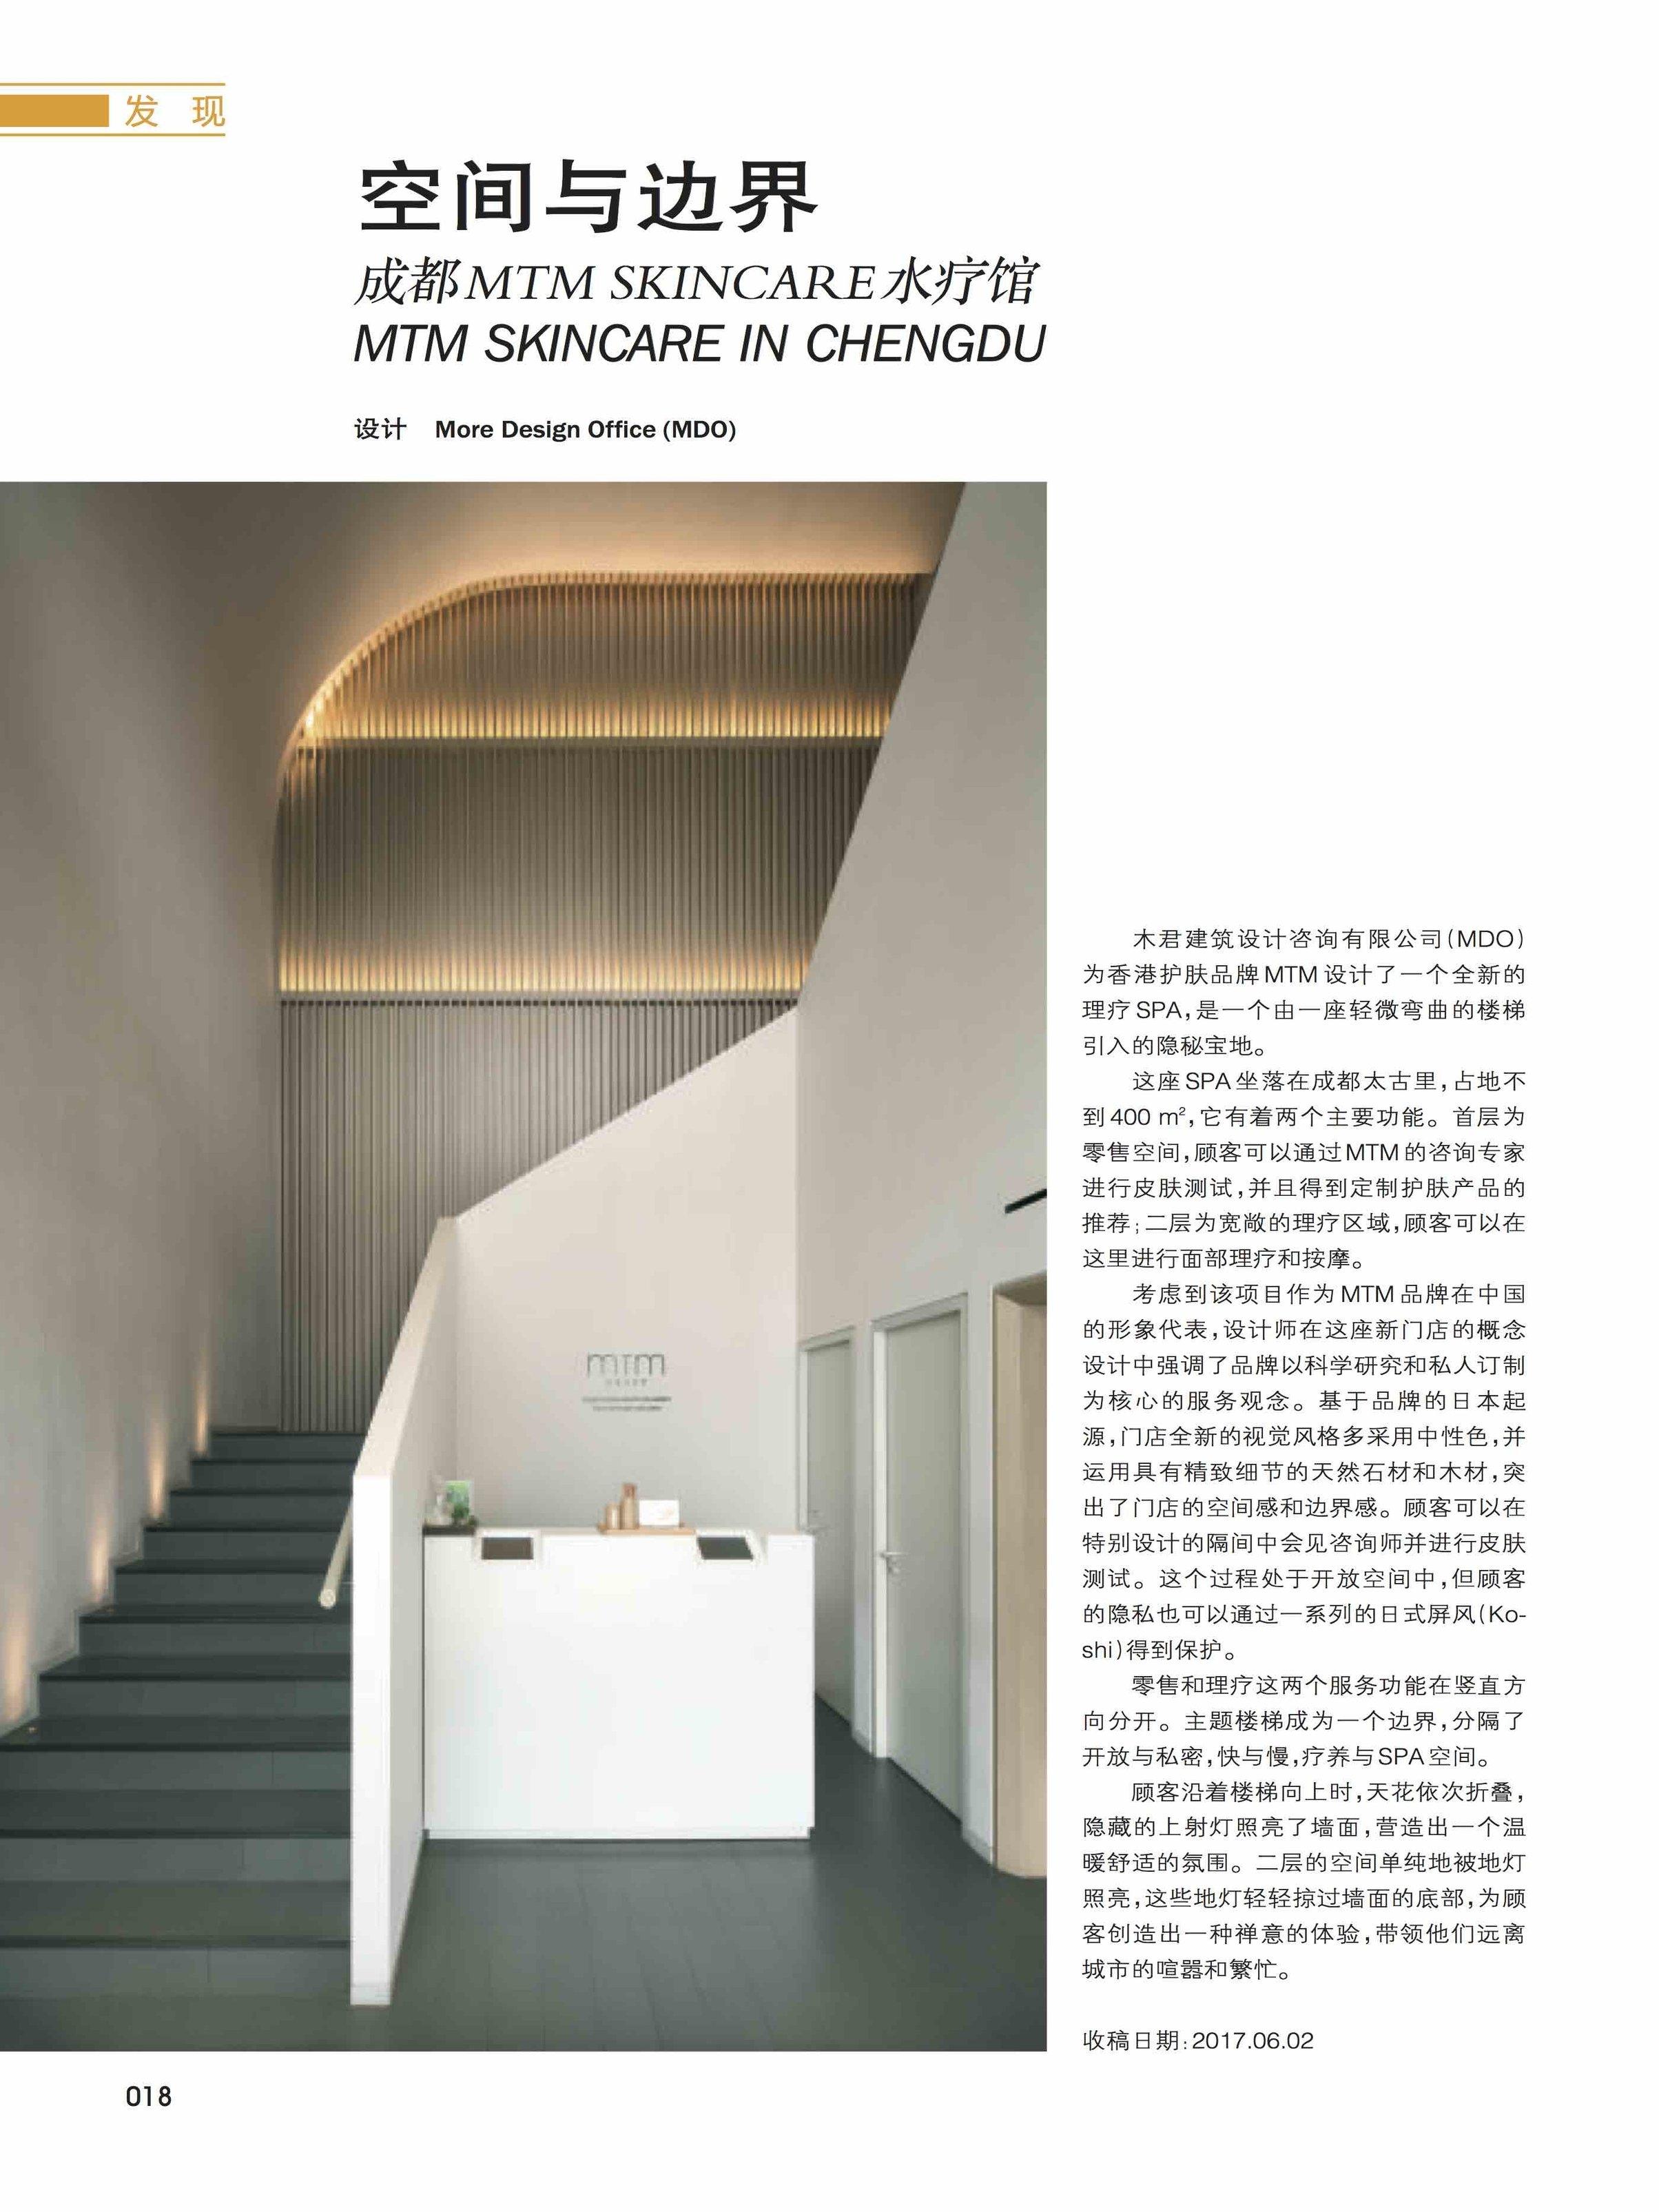 id+c | July 2017 - MTM Skincare Chengdu | More Design Office (MDO)